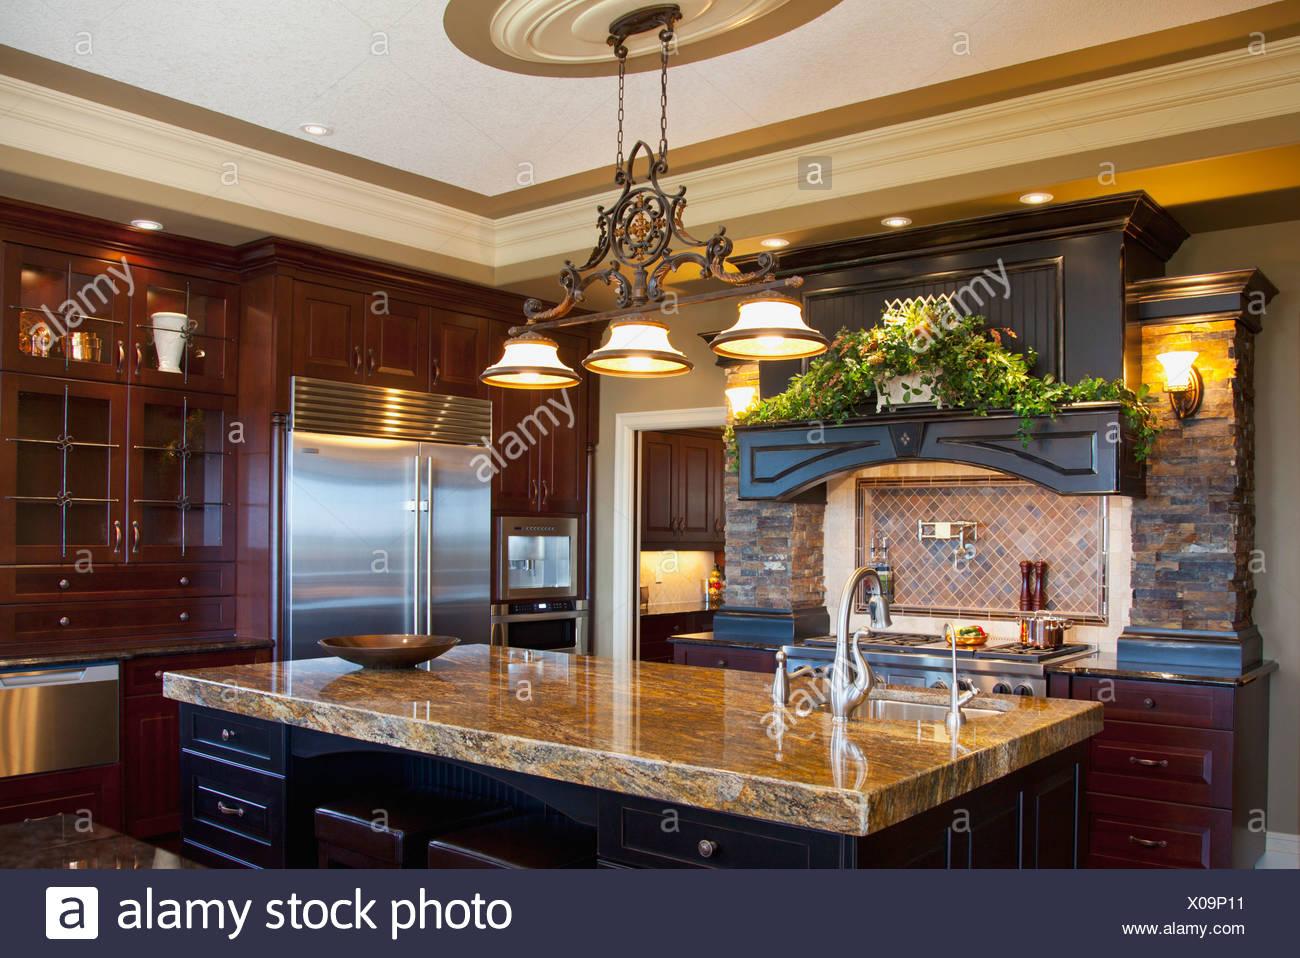 Granite Countertop Of Kitchen In Luxurious Show Home St Albert